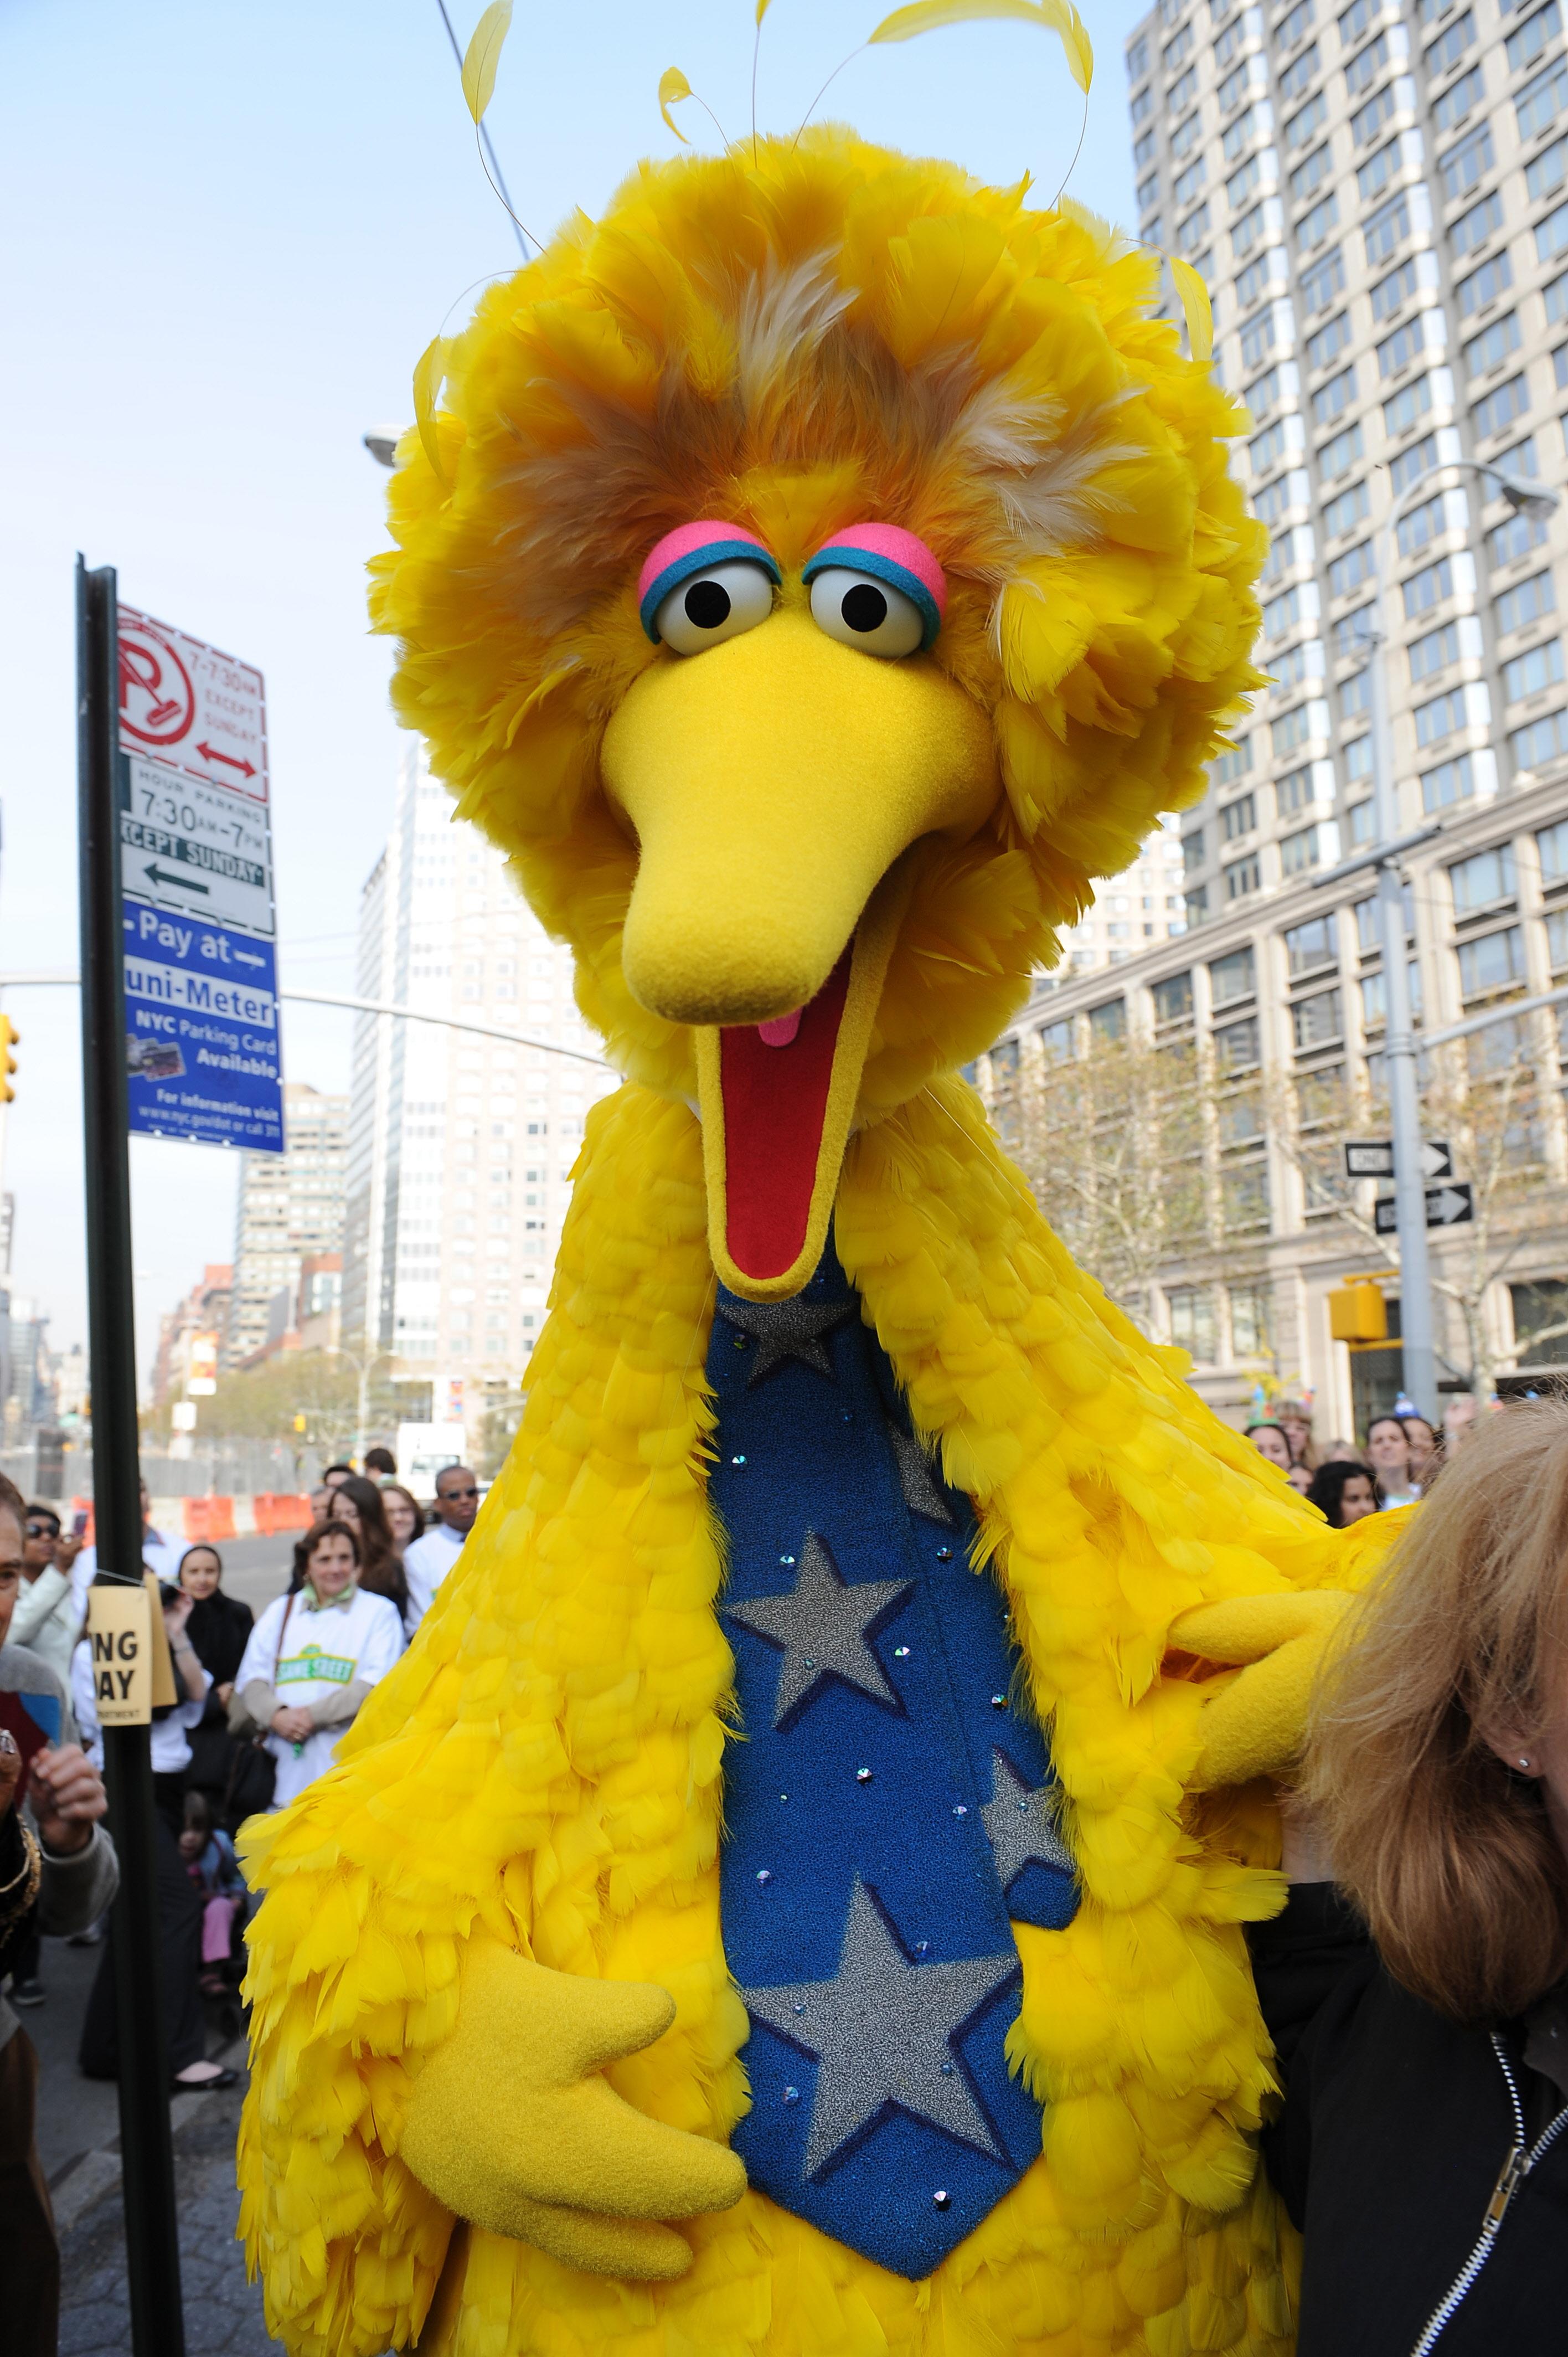 Sesame Street's Big Bird character in New York on Nov. 9, 2009.